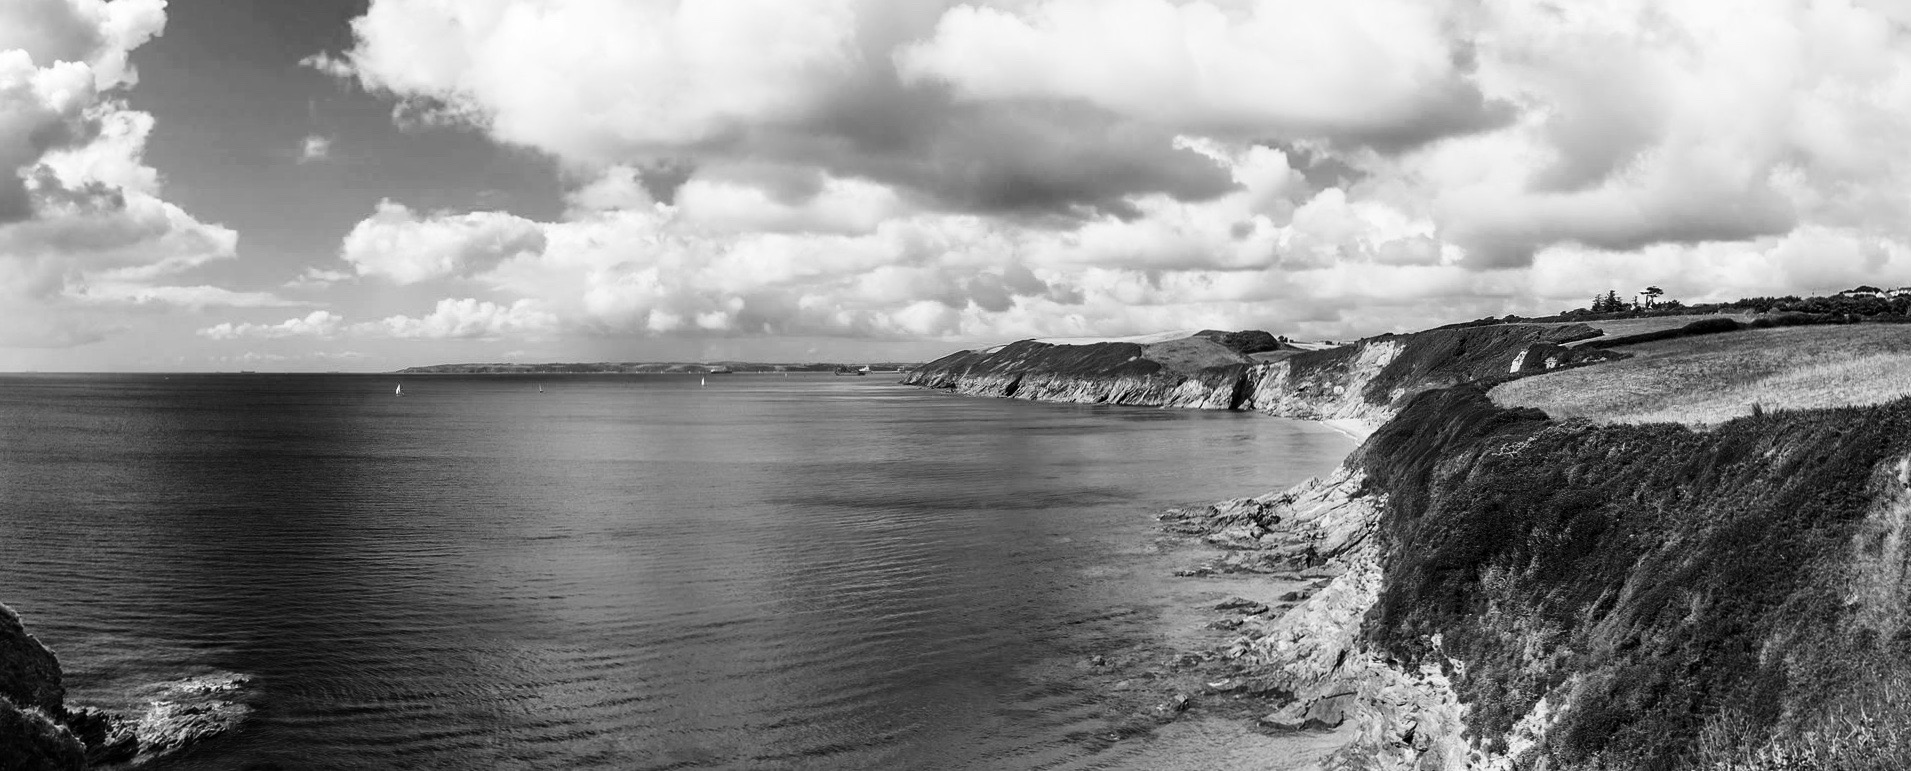 Cliffs around Porthbeor Beach, Cornwall © Raimond Spekking / CC BY-SA 4.0 (via Wikimedia Commons)